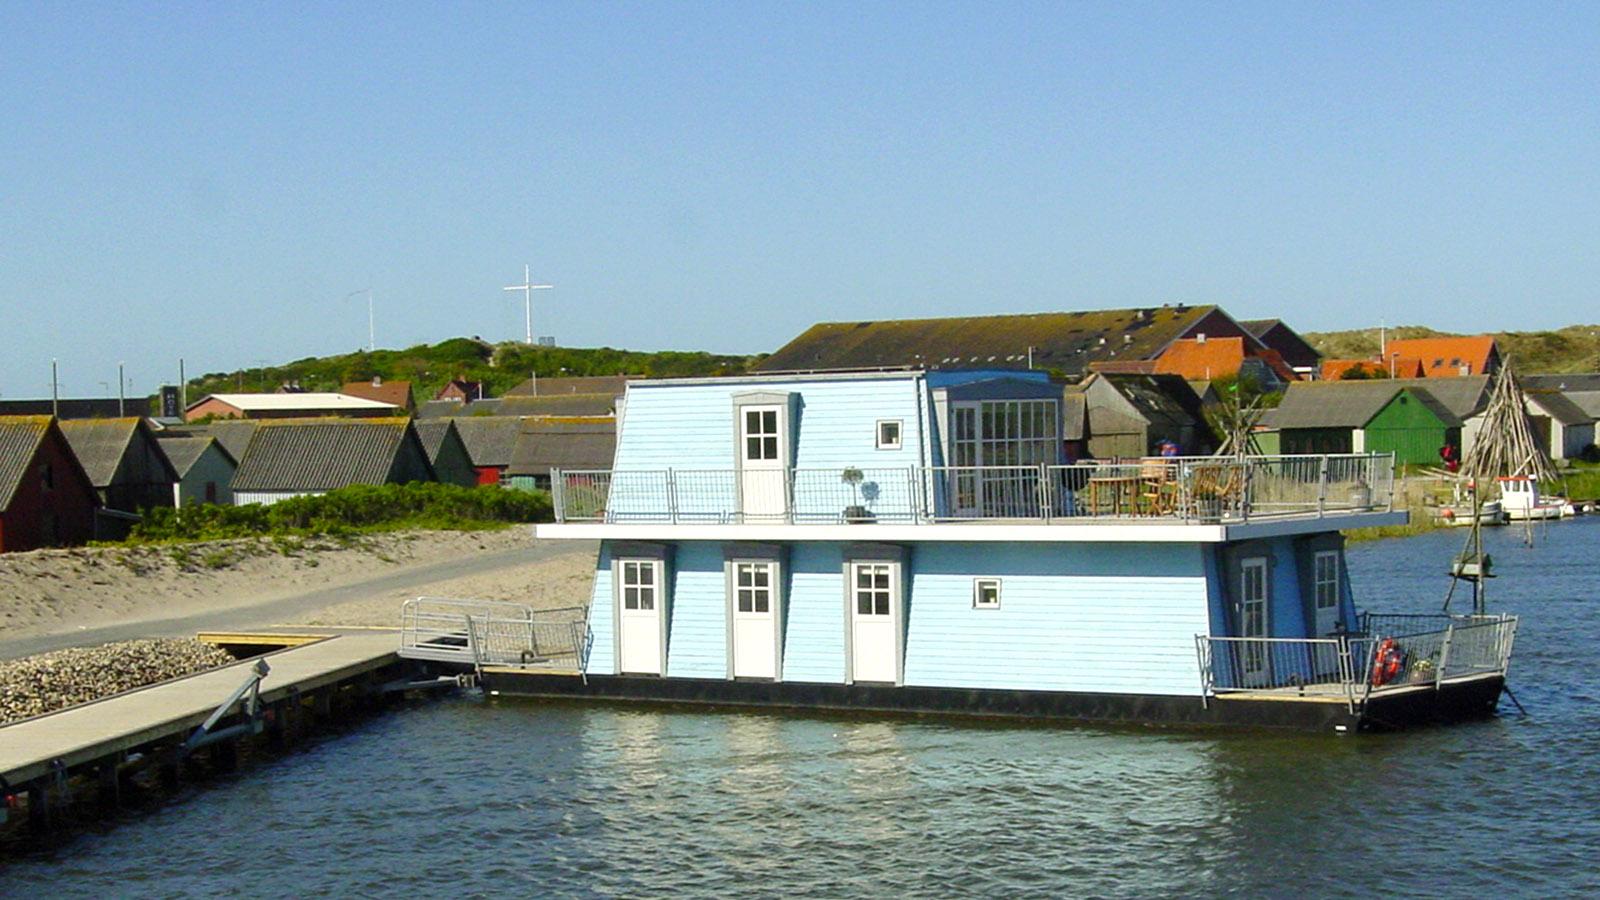 Schwimmende Ferienhäuser im Gammel Havn von Hvide Sande. Foto: Hilke Maunder